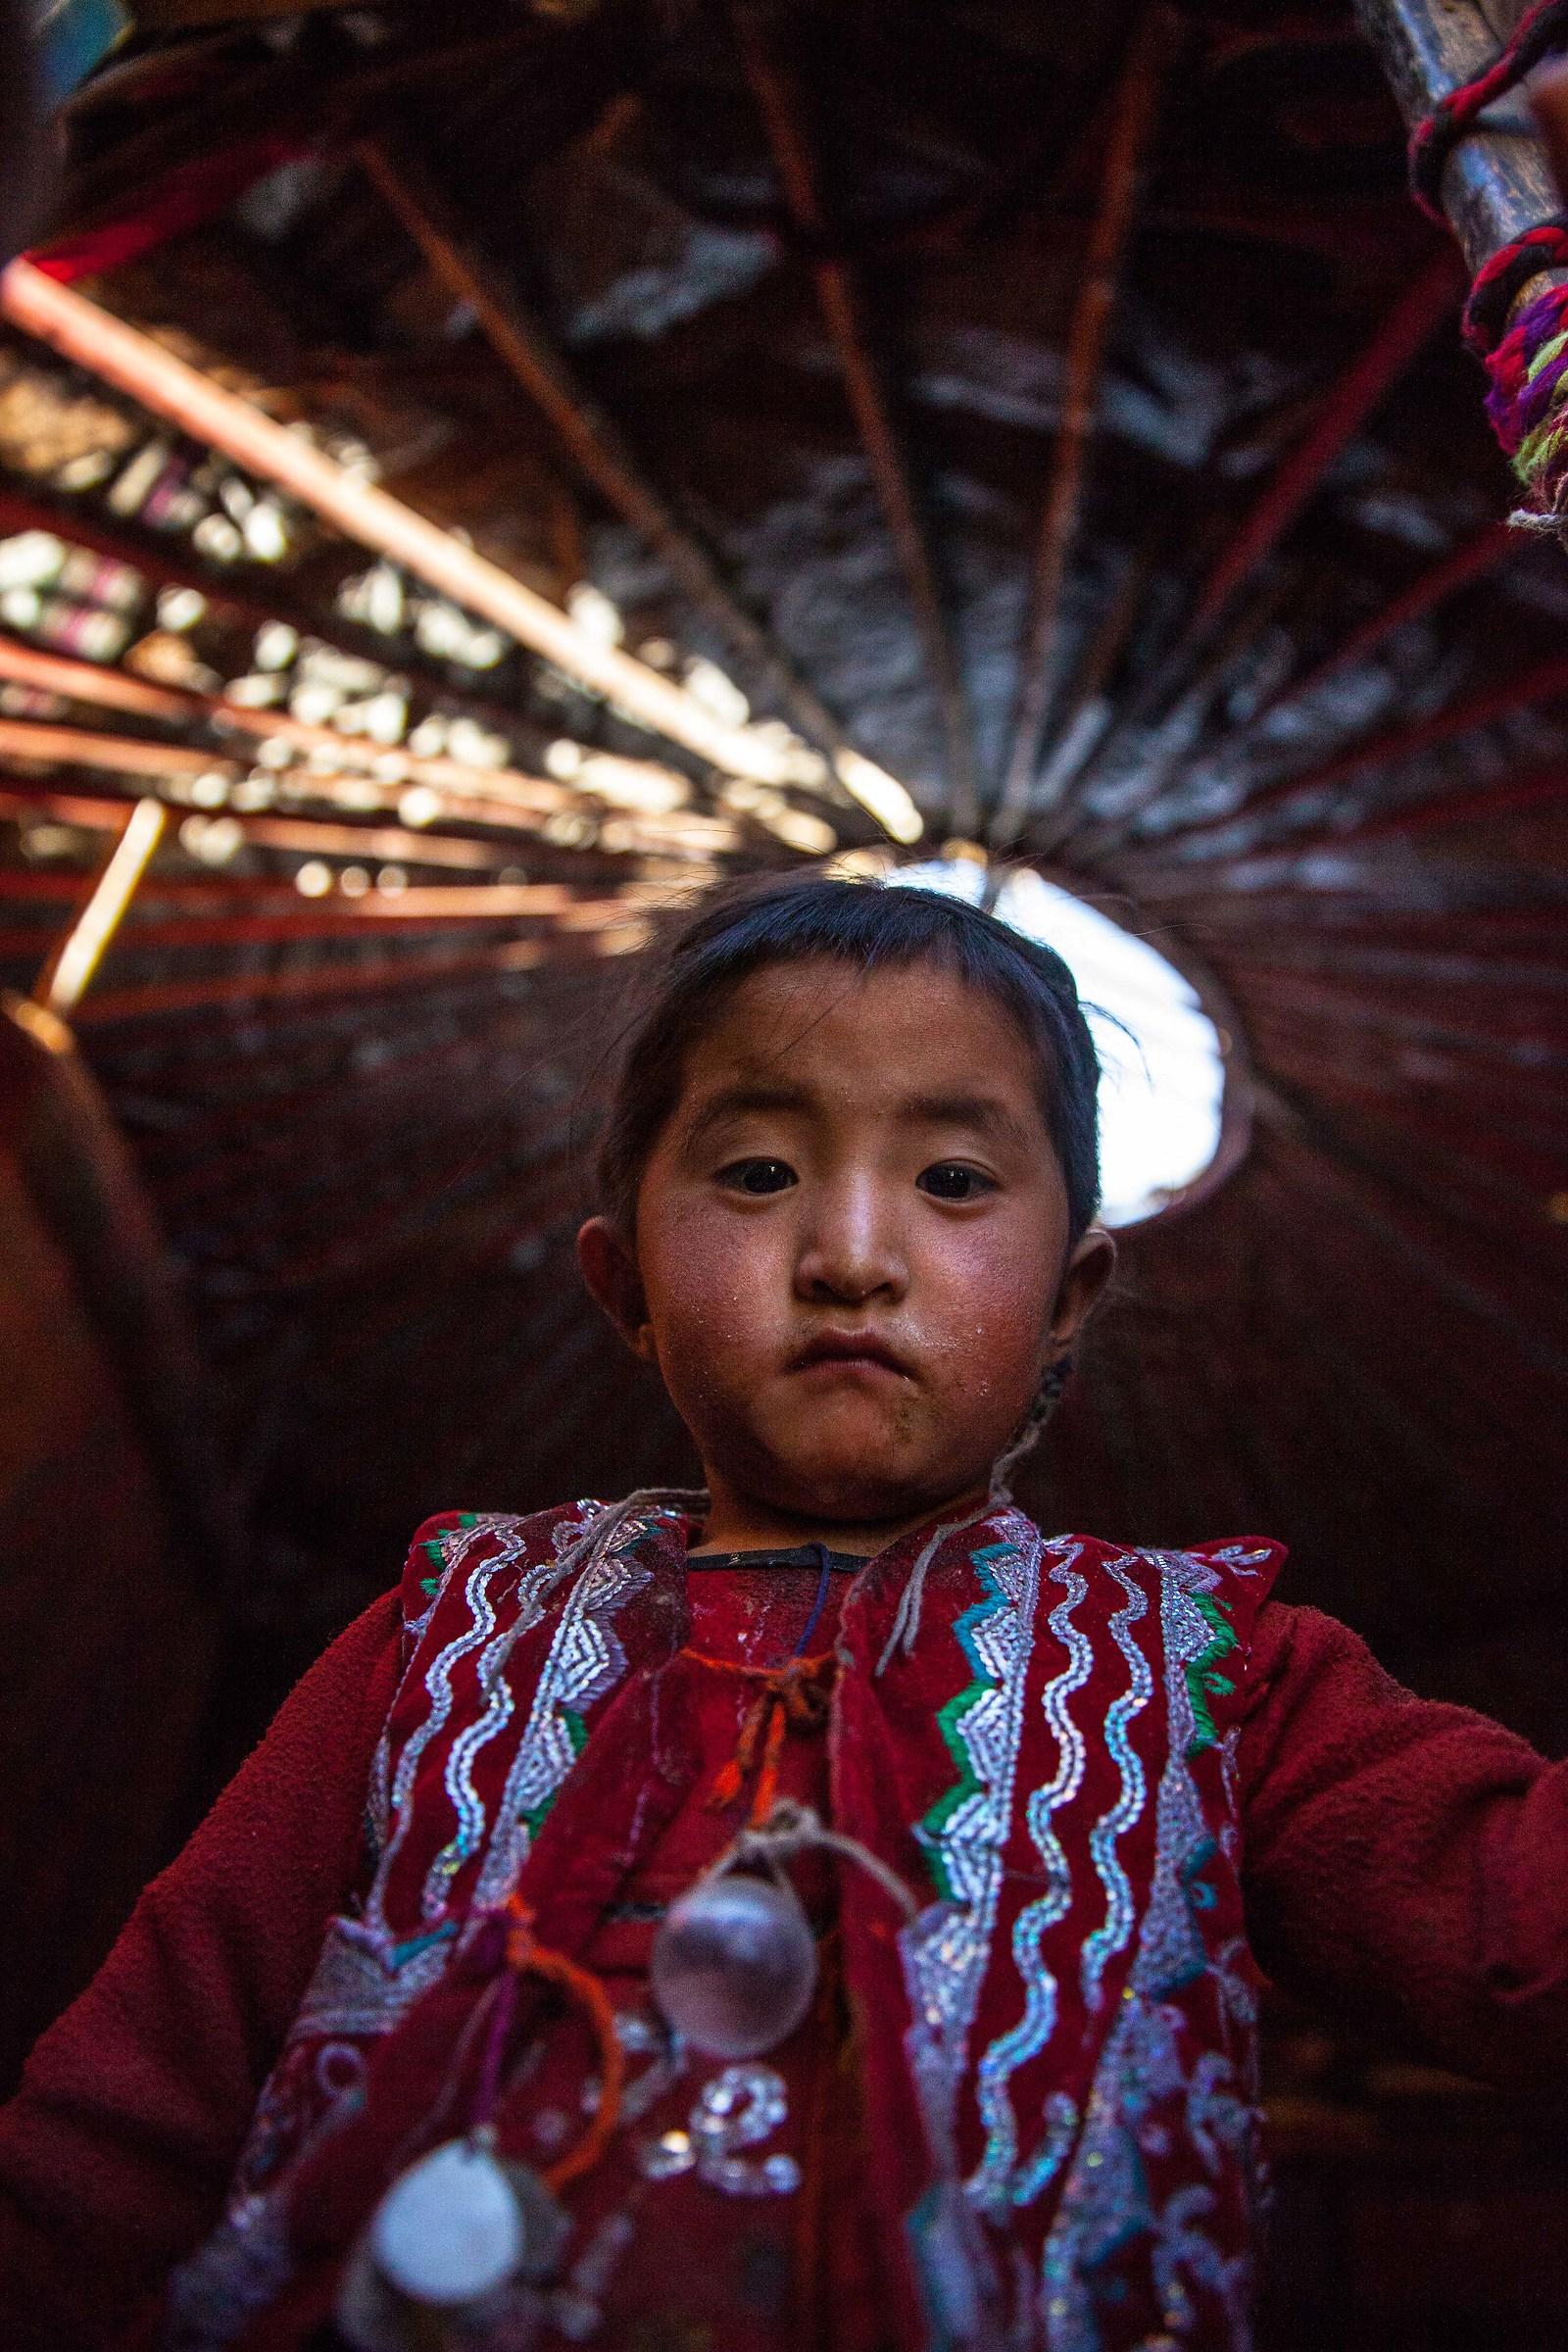 Kirgyz girl, Little Pamir, Afghanistan...